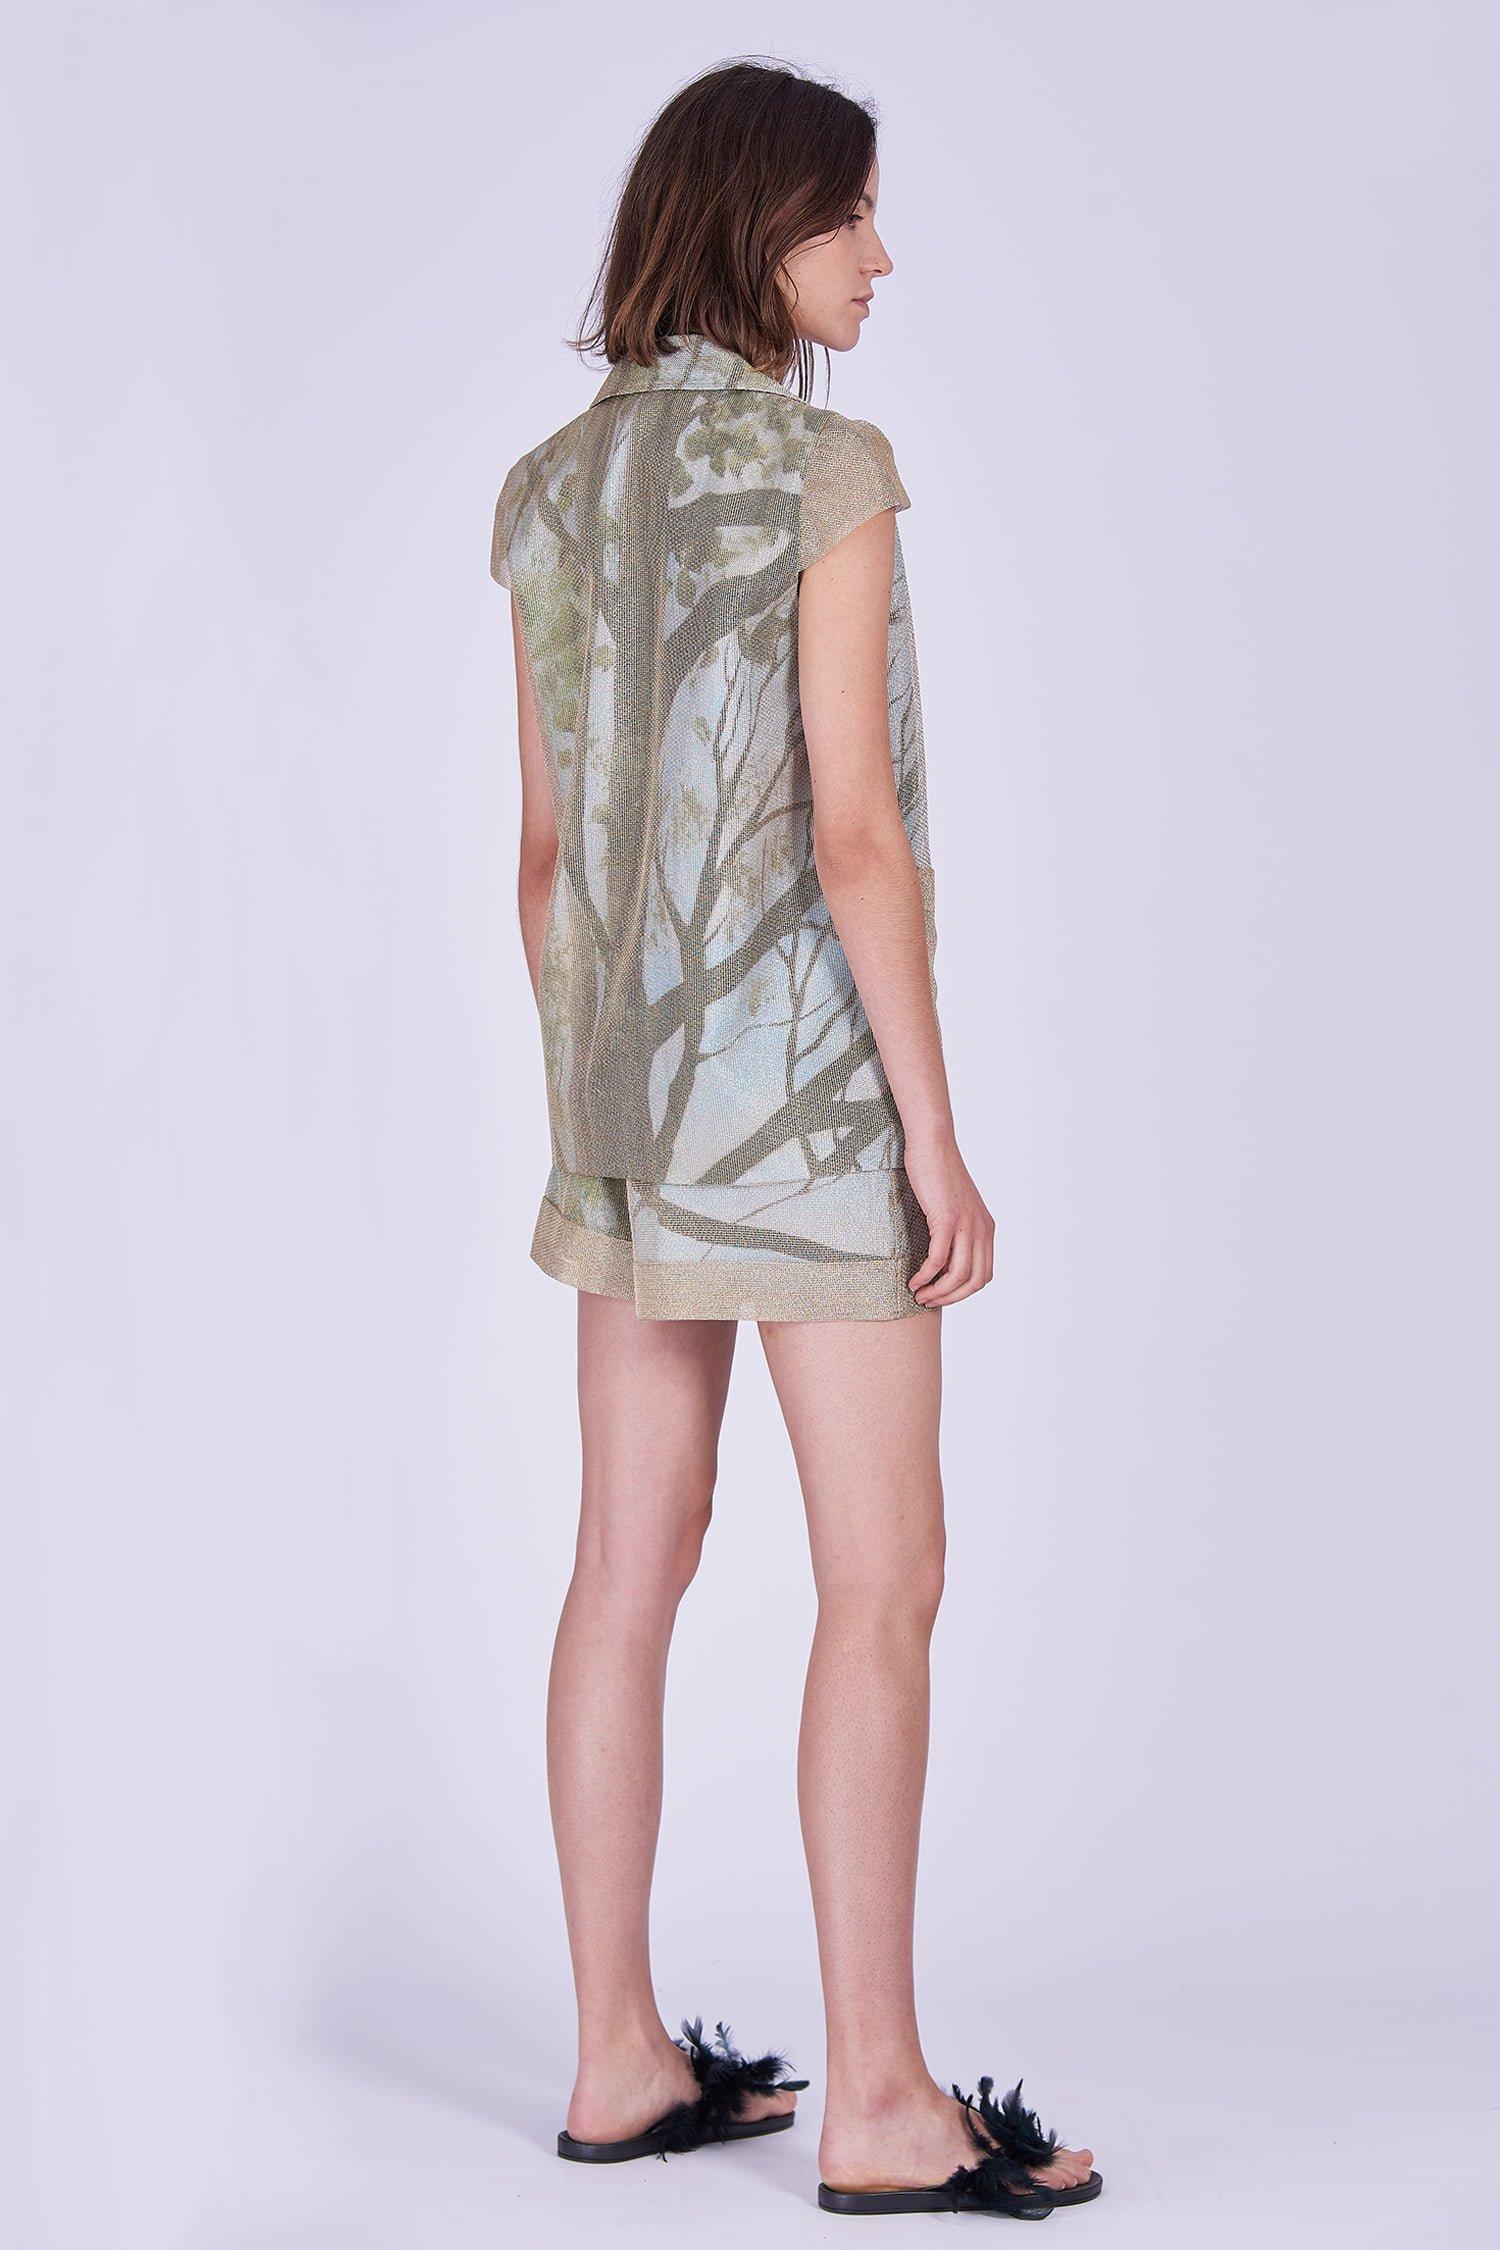 Acephala Ss2020 Gold Jacket Print Shorts Zlota Marynarka Szorty Back Side